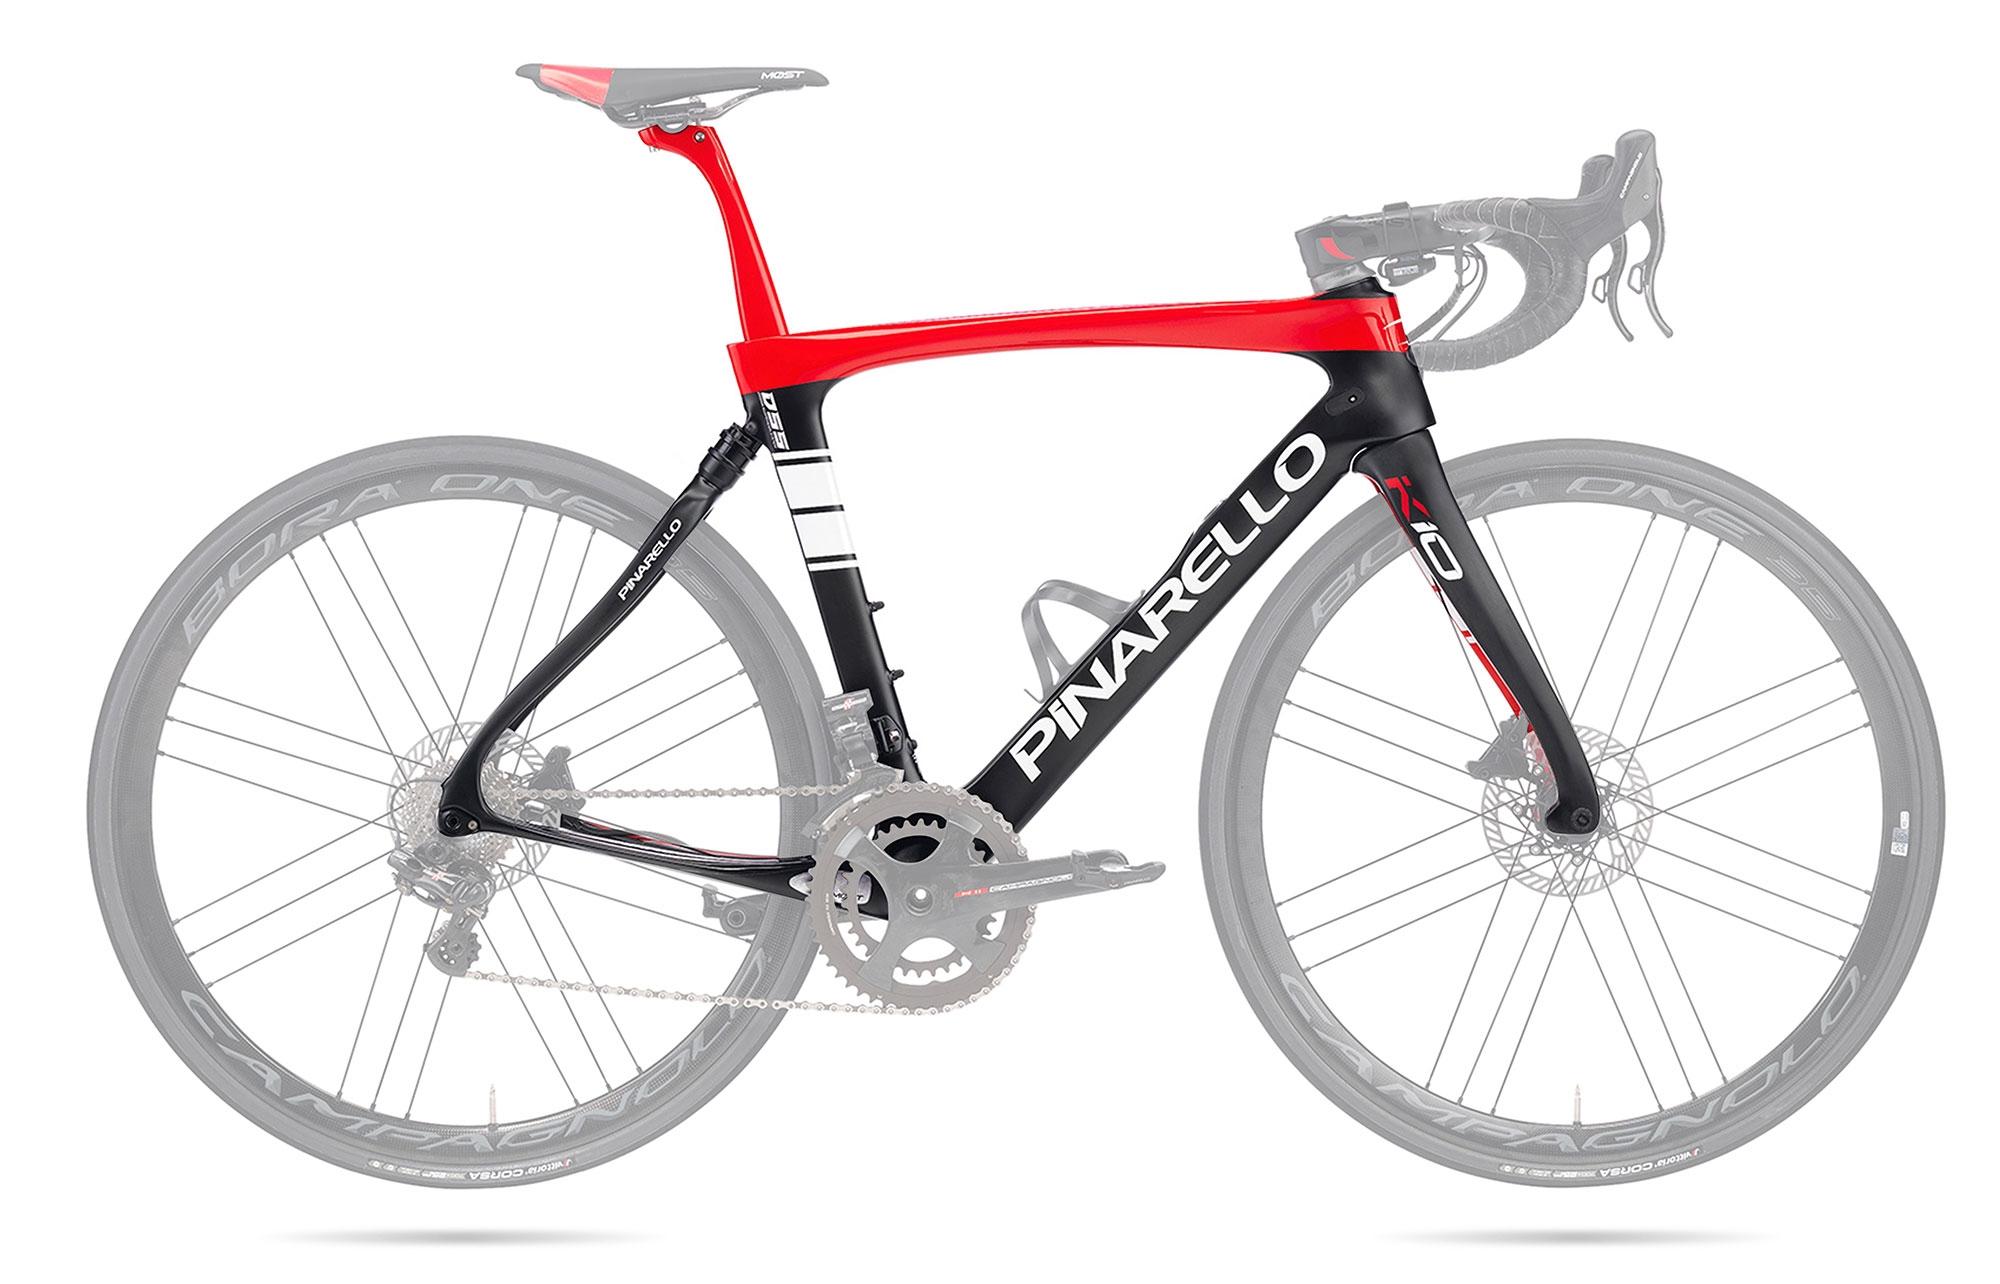 9ec682f3d85 Pinarello Dogma K10S Disk Frameset | R&A Cycles